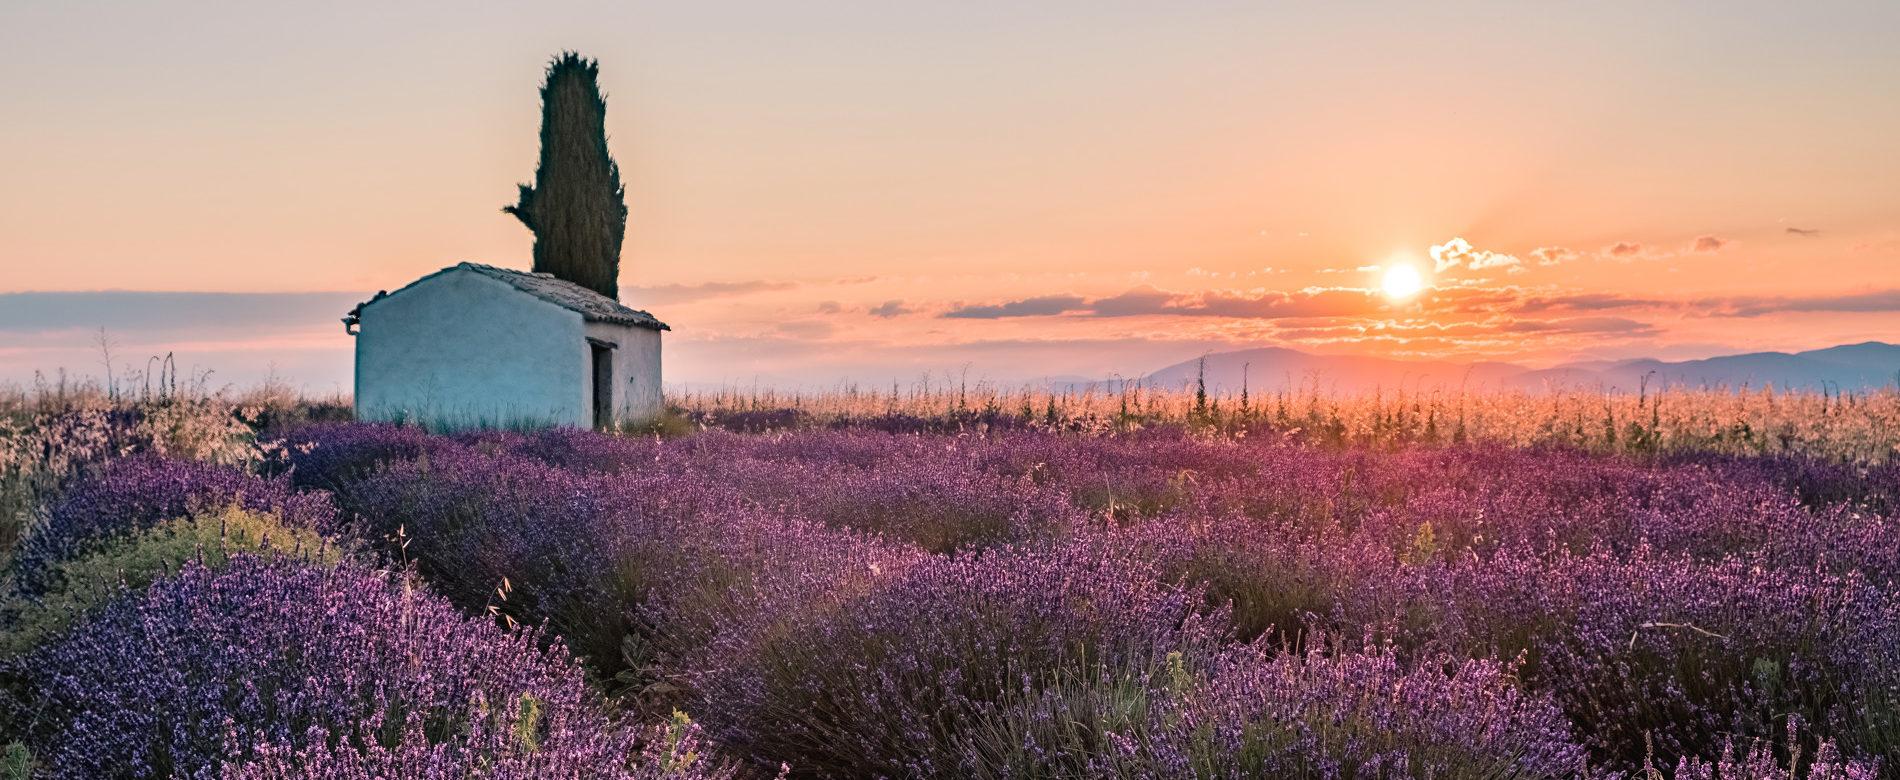 Champ de lavande plateau de Valensole ©Teddy Verneuil